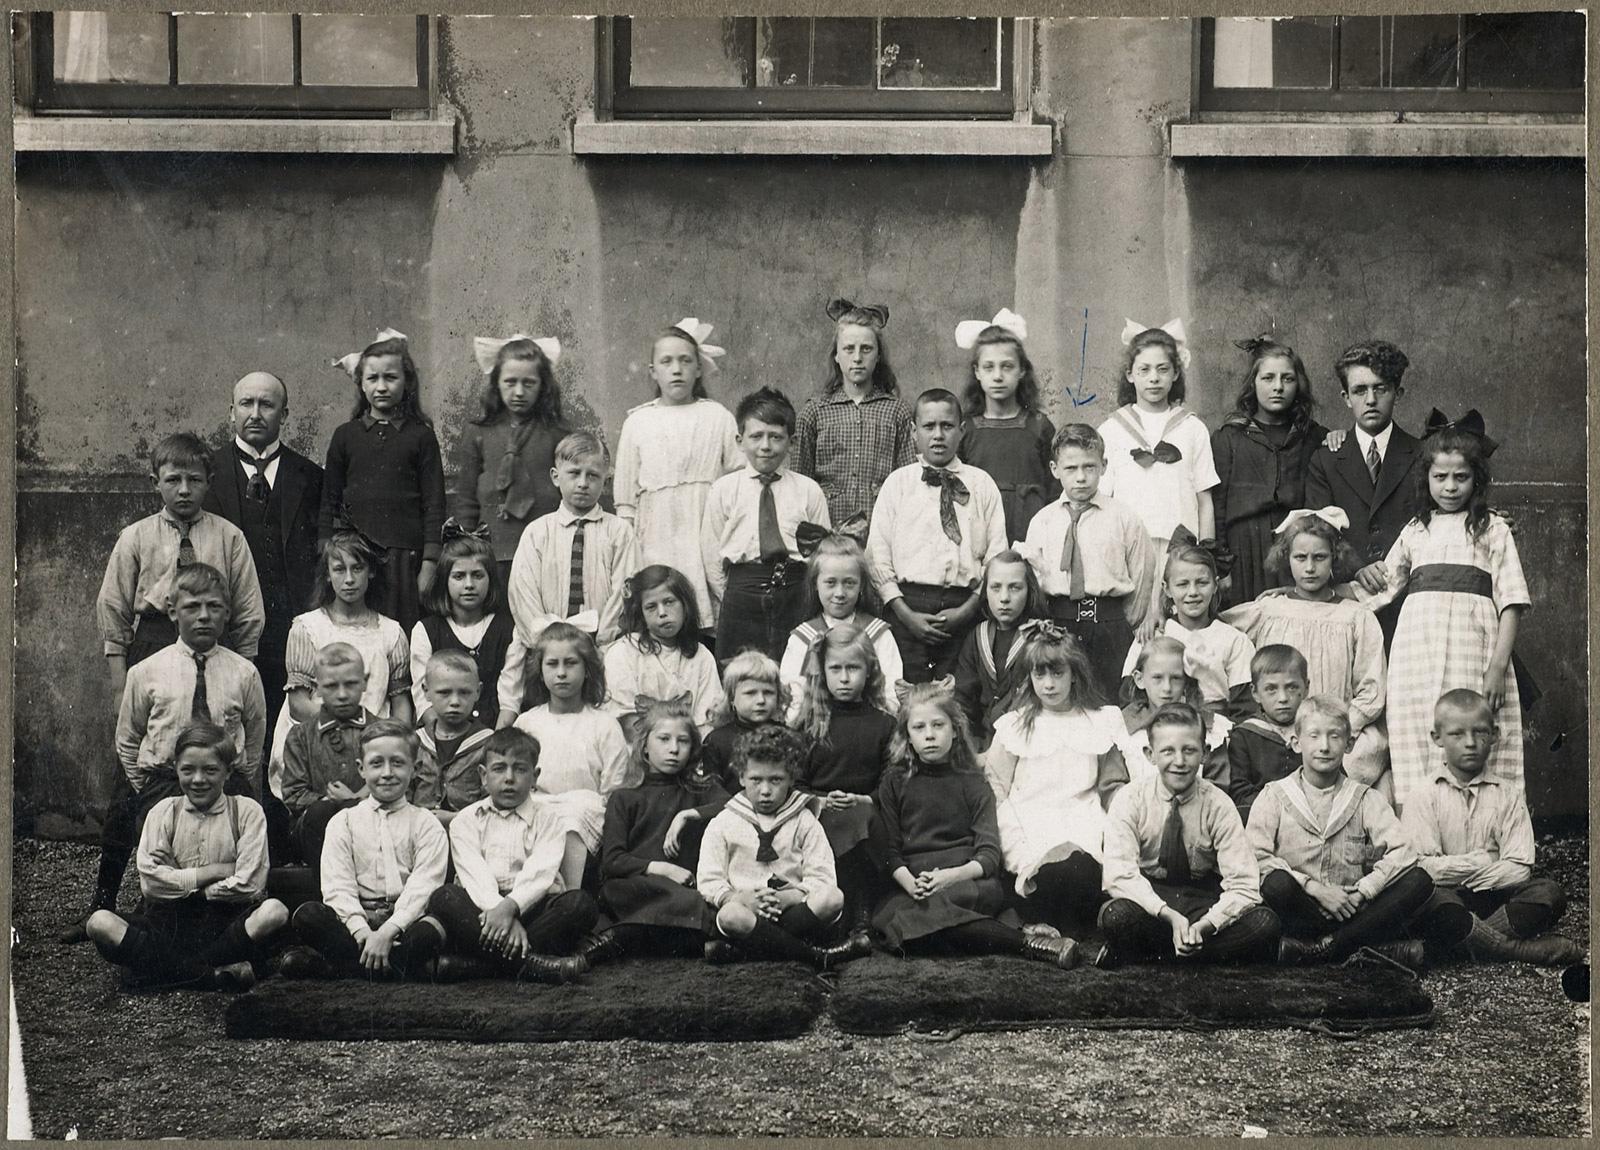 Melle schilder | Lagere school / primary school Wittenburg, film op fotopapier